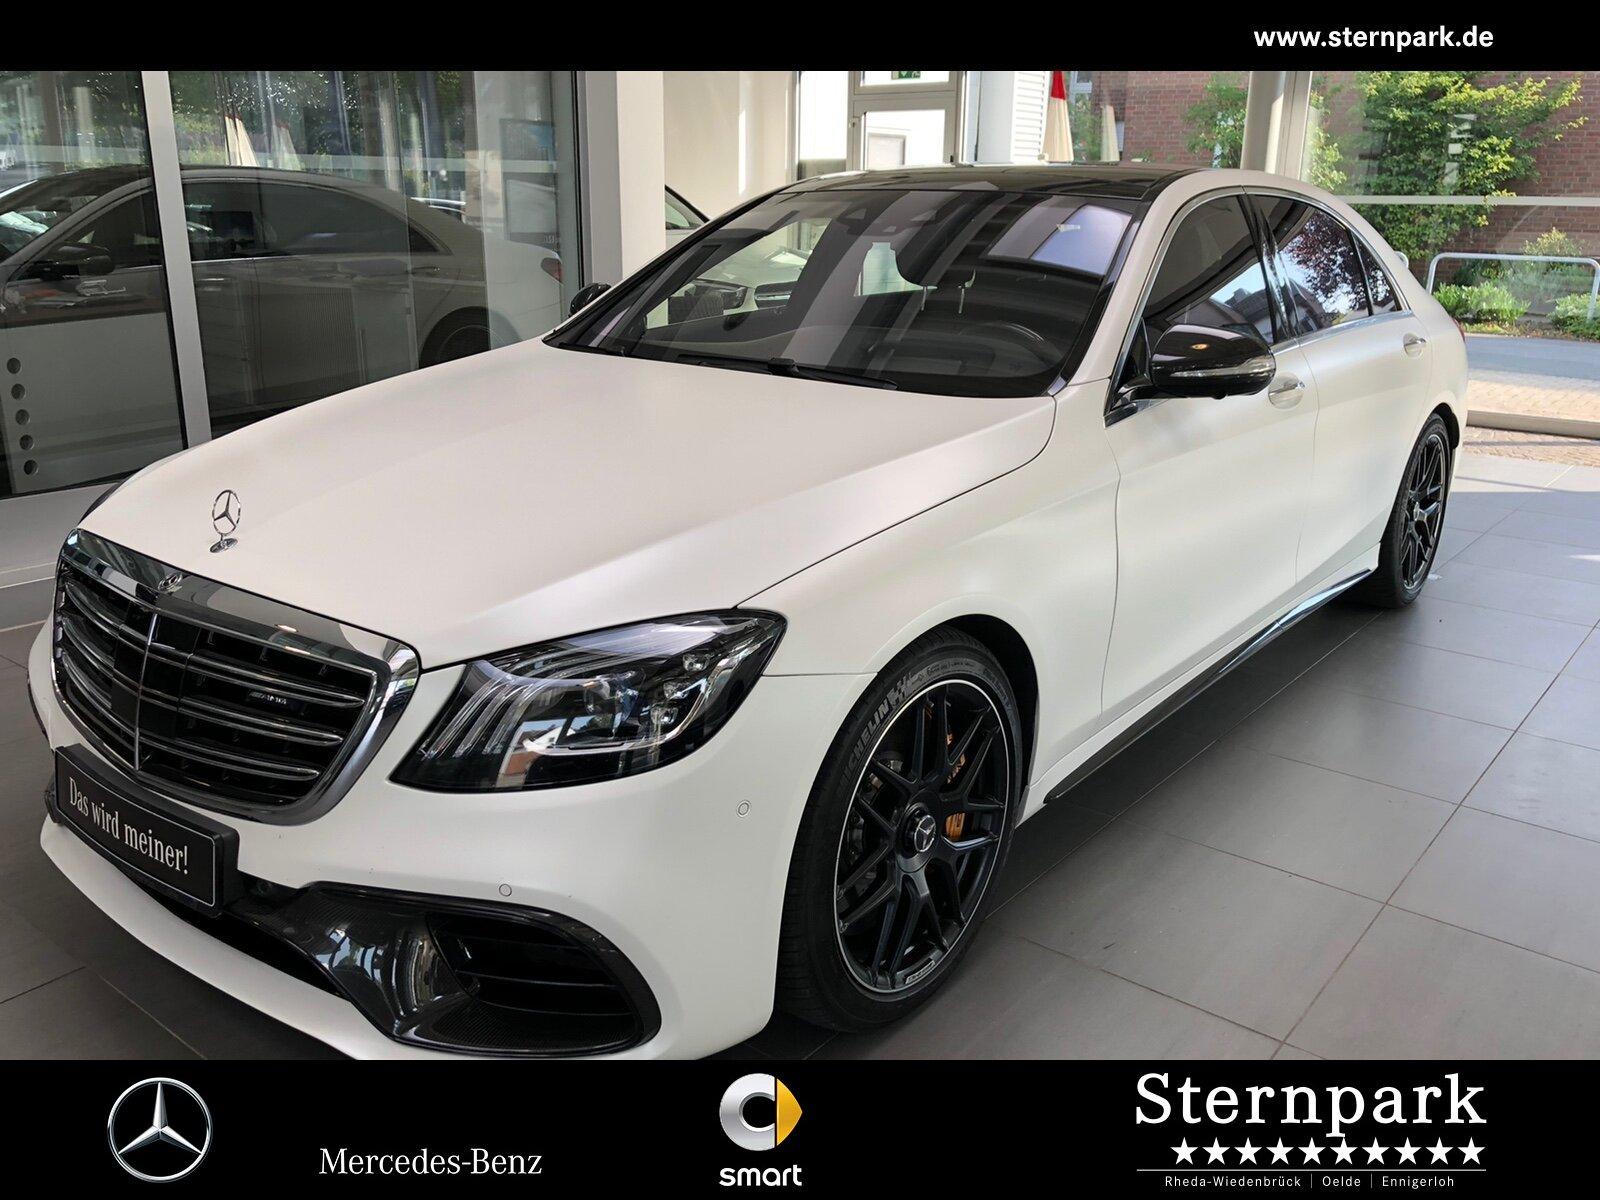 Mercedes-Benz S63 AMG 4M+L COMAND*Burm3D*Pano*Standh*FahrAss-P, Jahr 2019, Benzin